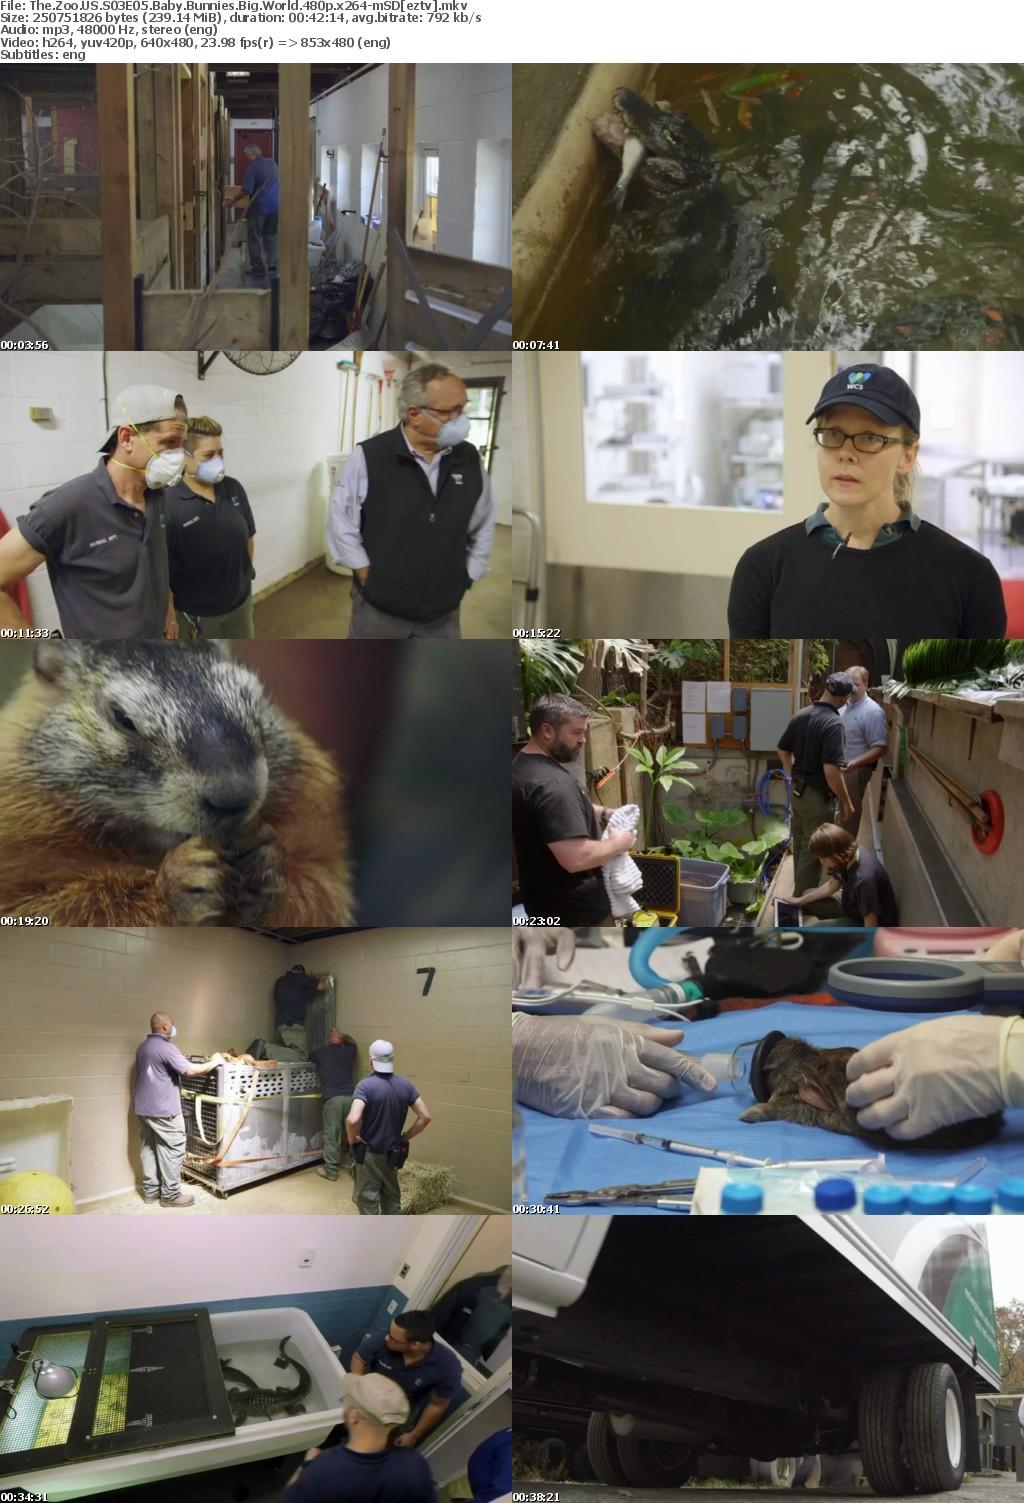 The Zoo US S03E05 Baby Bunnies Big World 480p x264-mSD